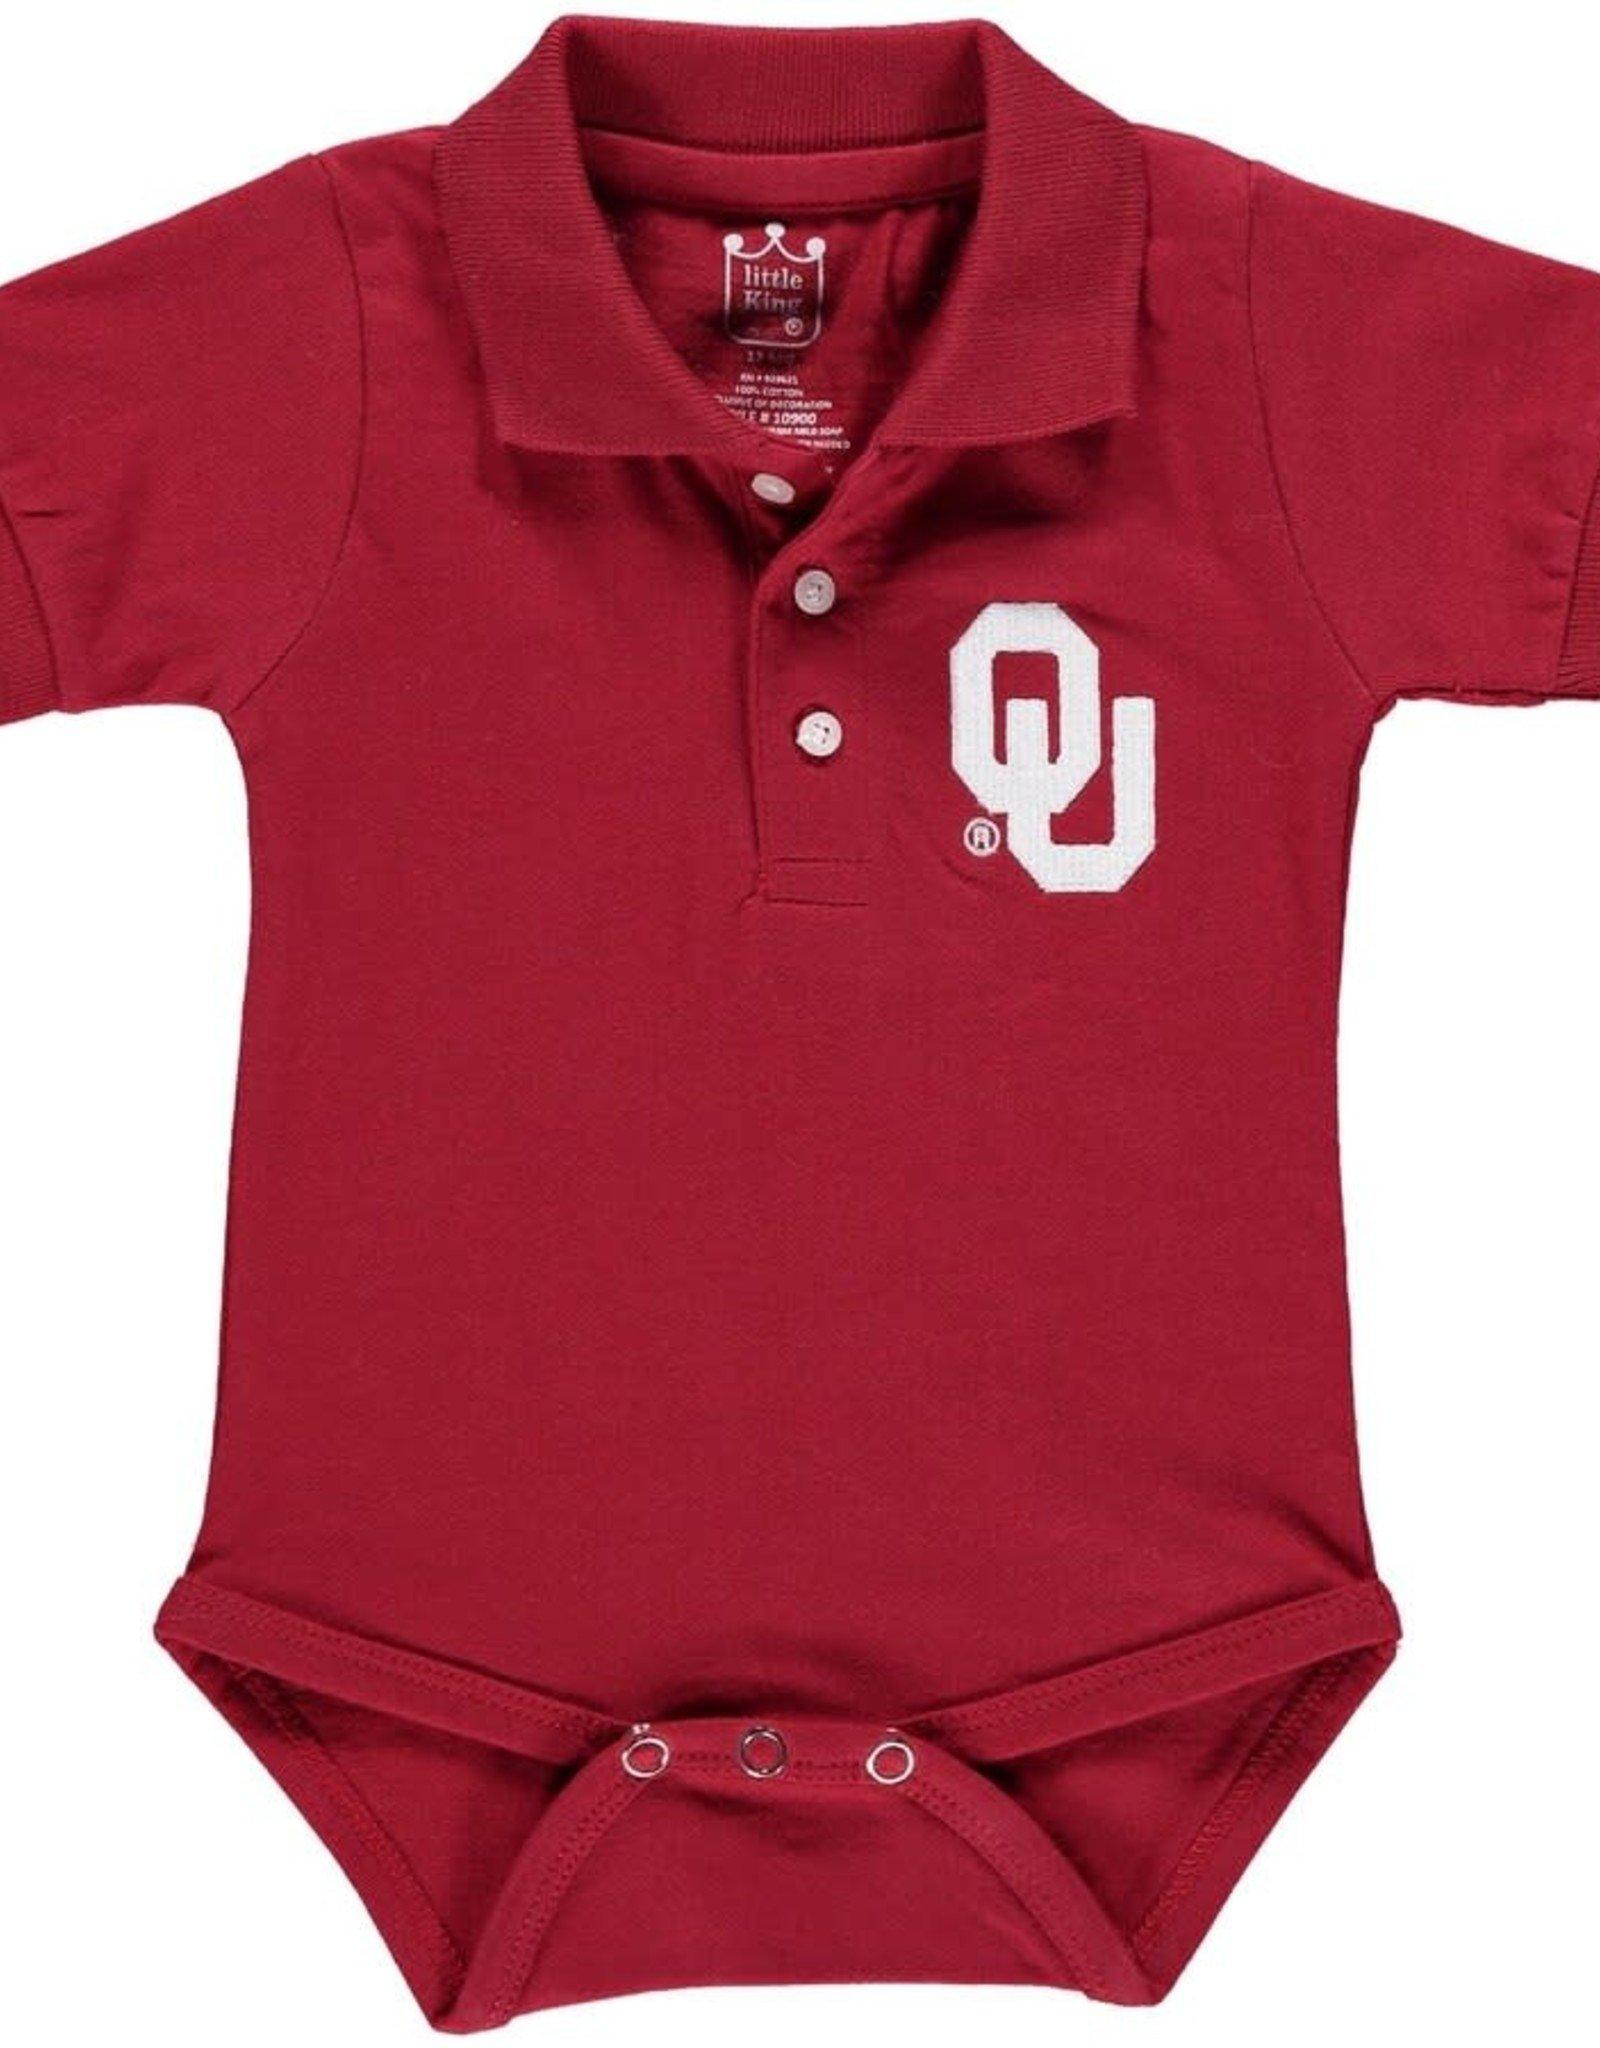 Little King Infant Cotton Polo Onesie